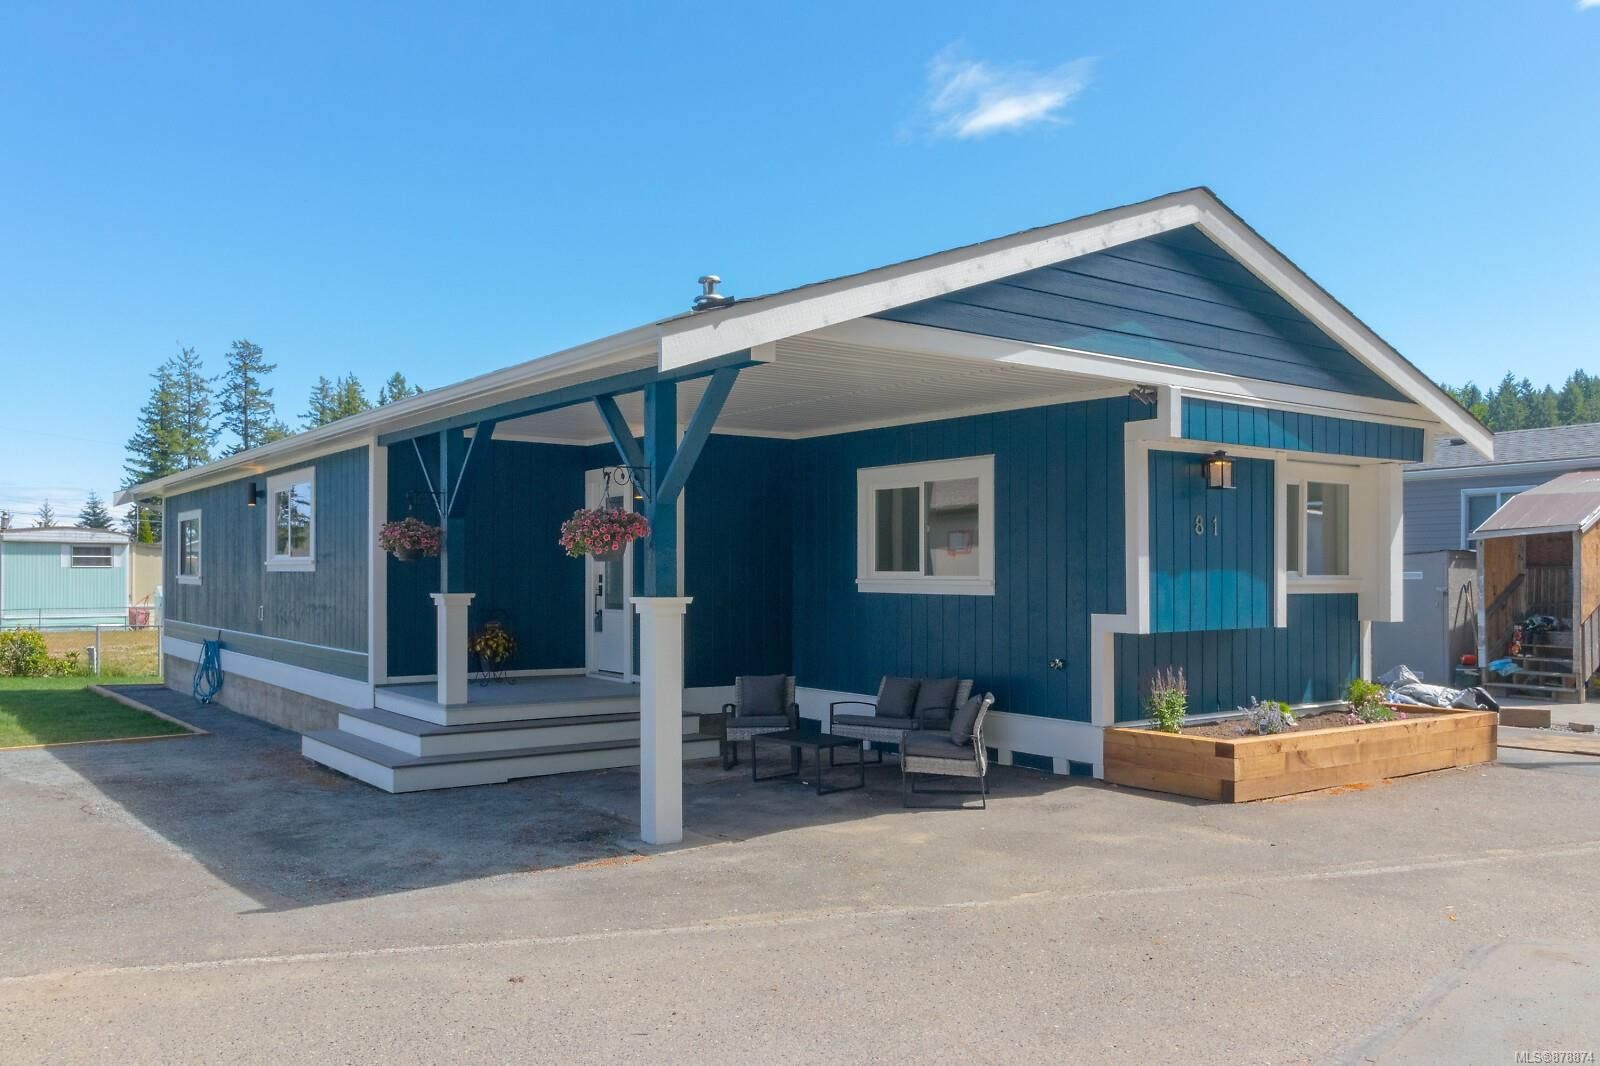 Main Photo: 81 2911 Sooke Lake Rd in : La Goldstream Manufactured Home for sale (Langford)  : MLS®# 878874